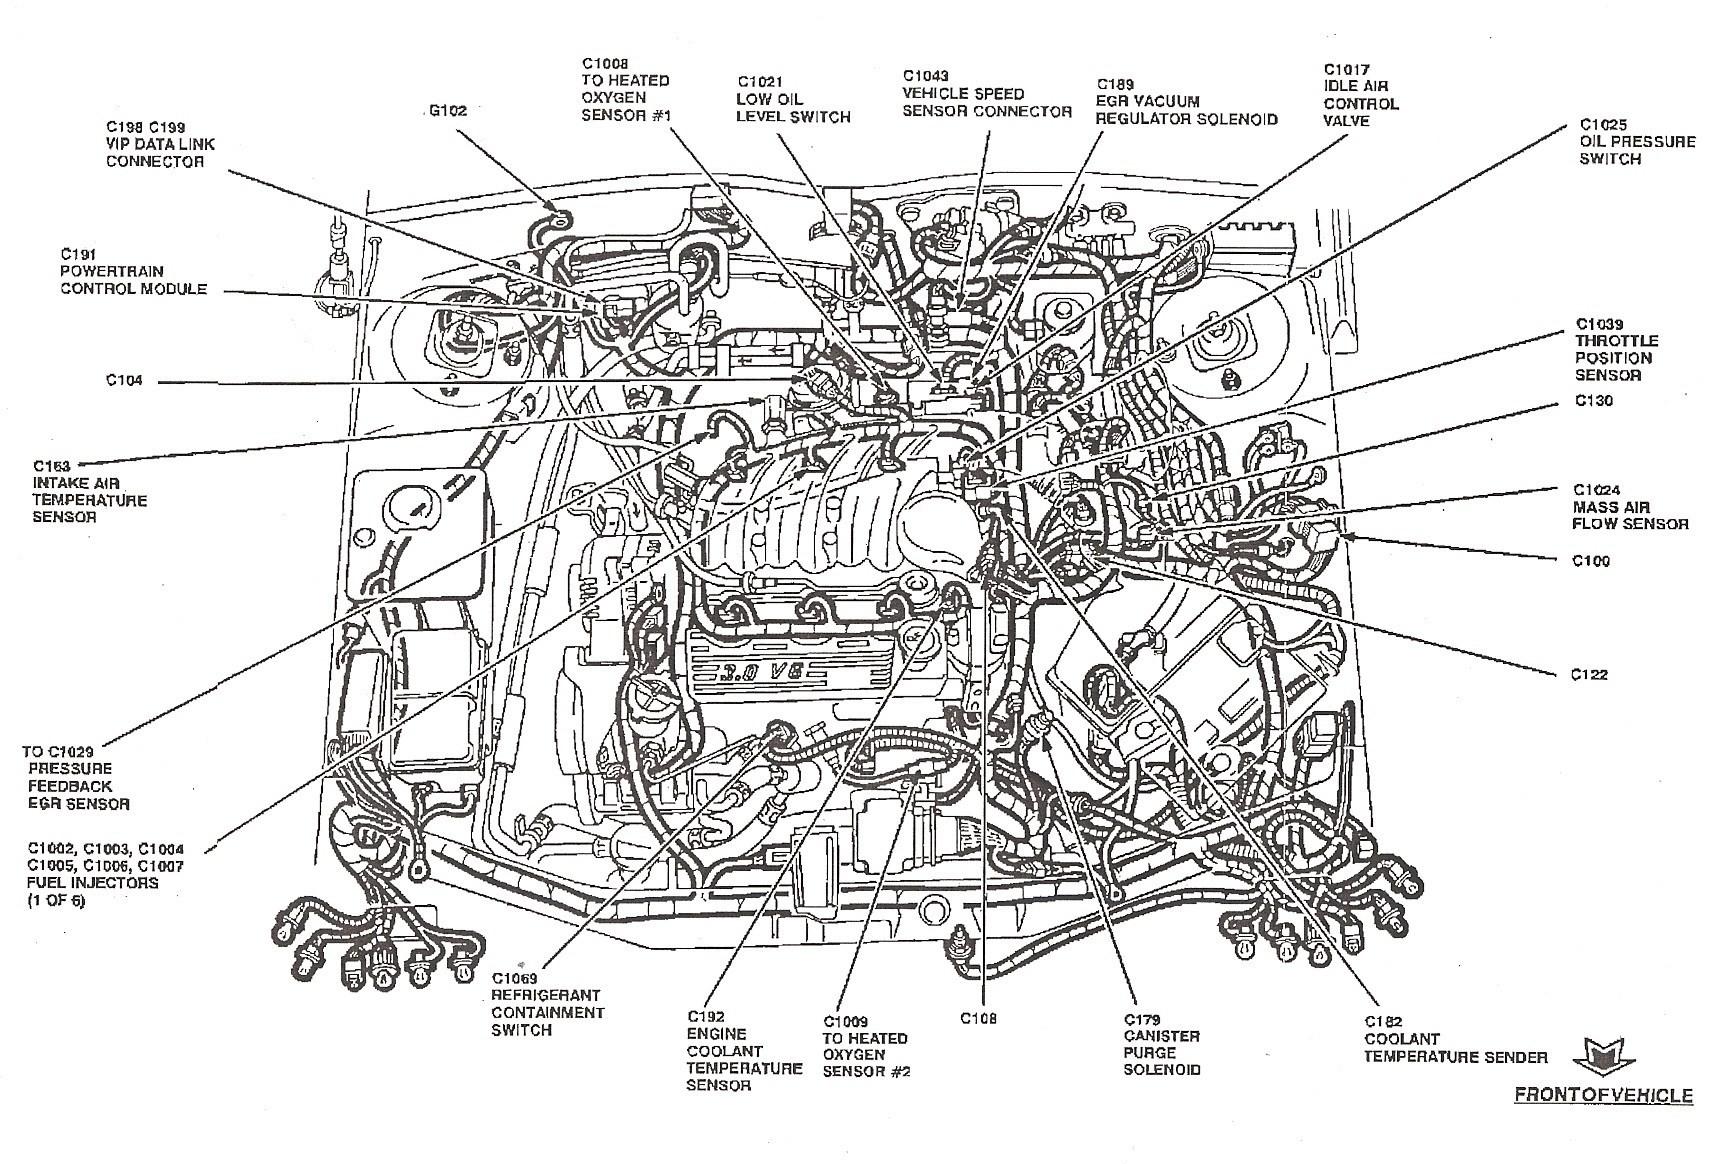 Ford Focus Engine Diagram 2001 ford Focus Fuel System Diagram Wiring Diagram Used